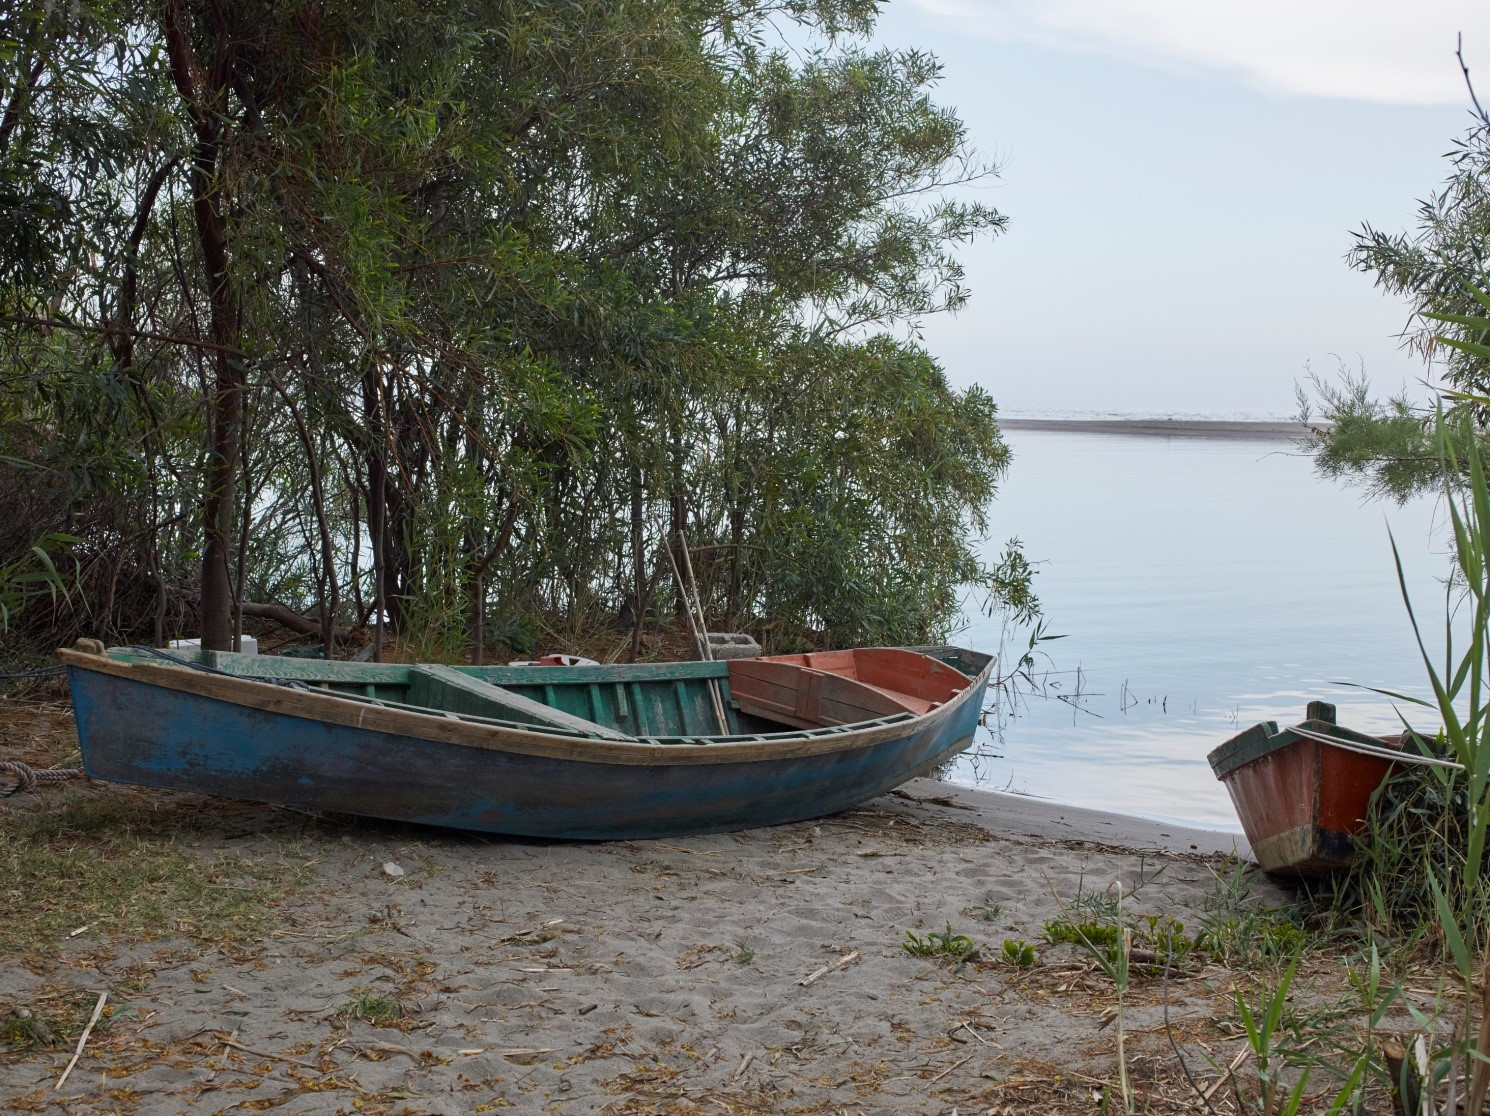 clld017-boat